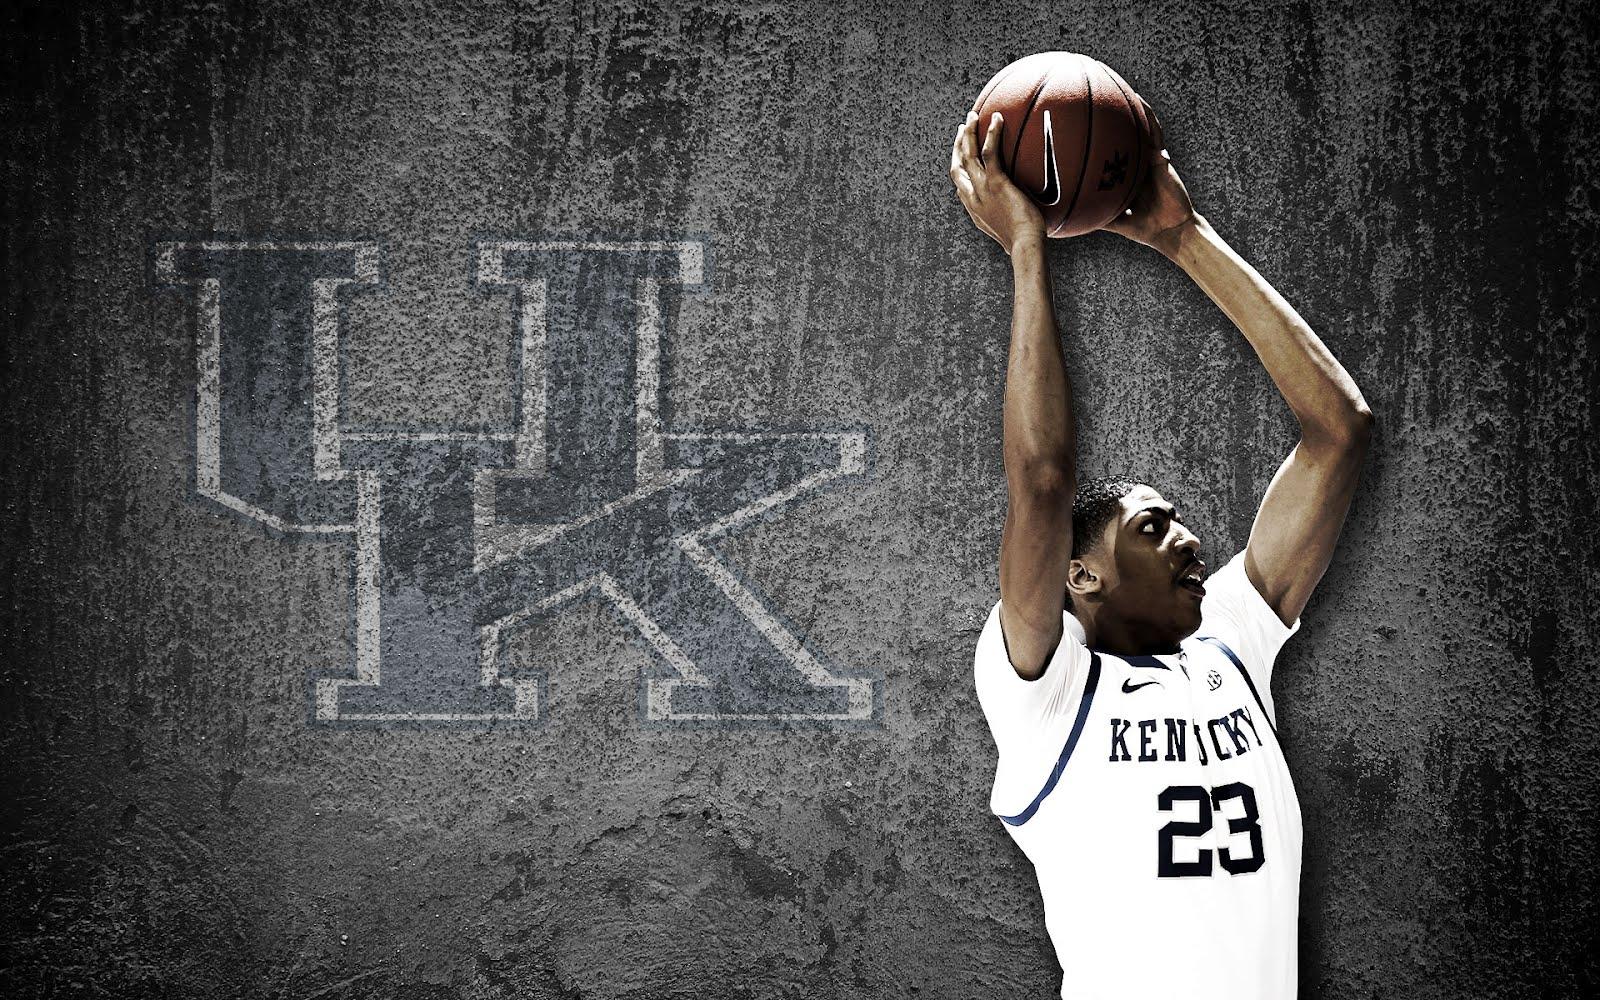 Kentucky Basketball Wallpaper Iphone American college basketball 1600x1000